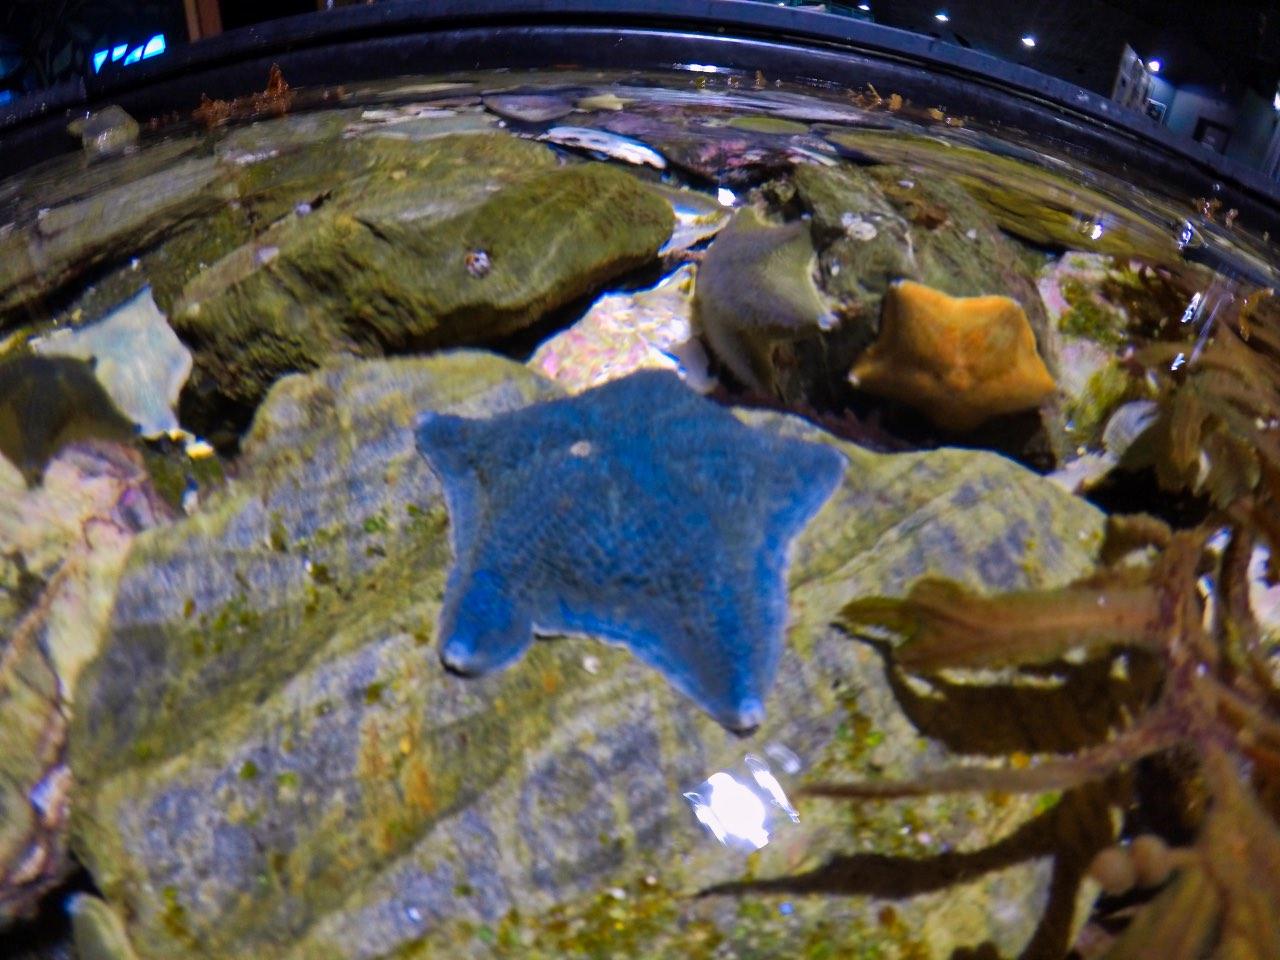 Picton-Aquarium-ew-Zealand-Stafish-GoPro-Hero-5.